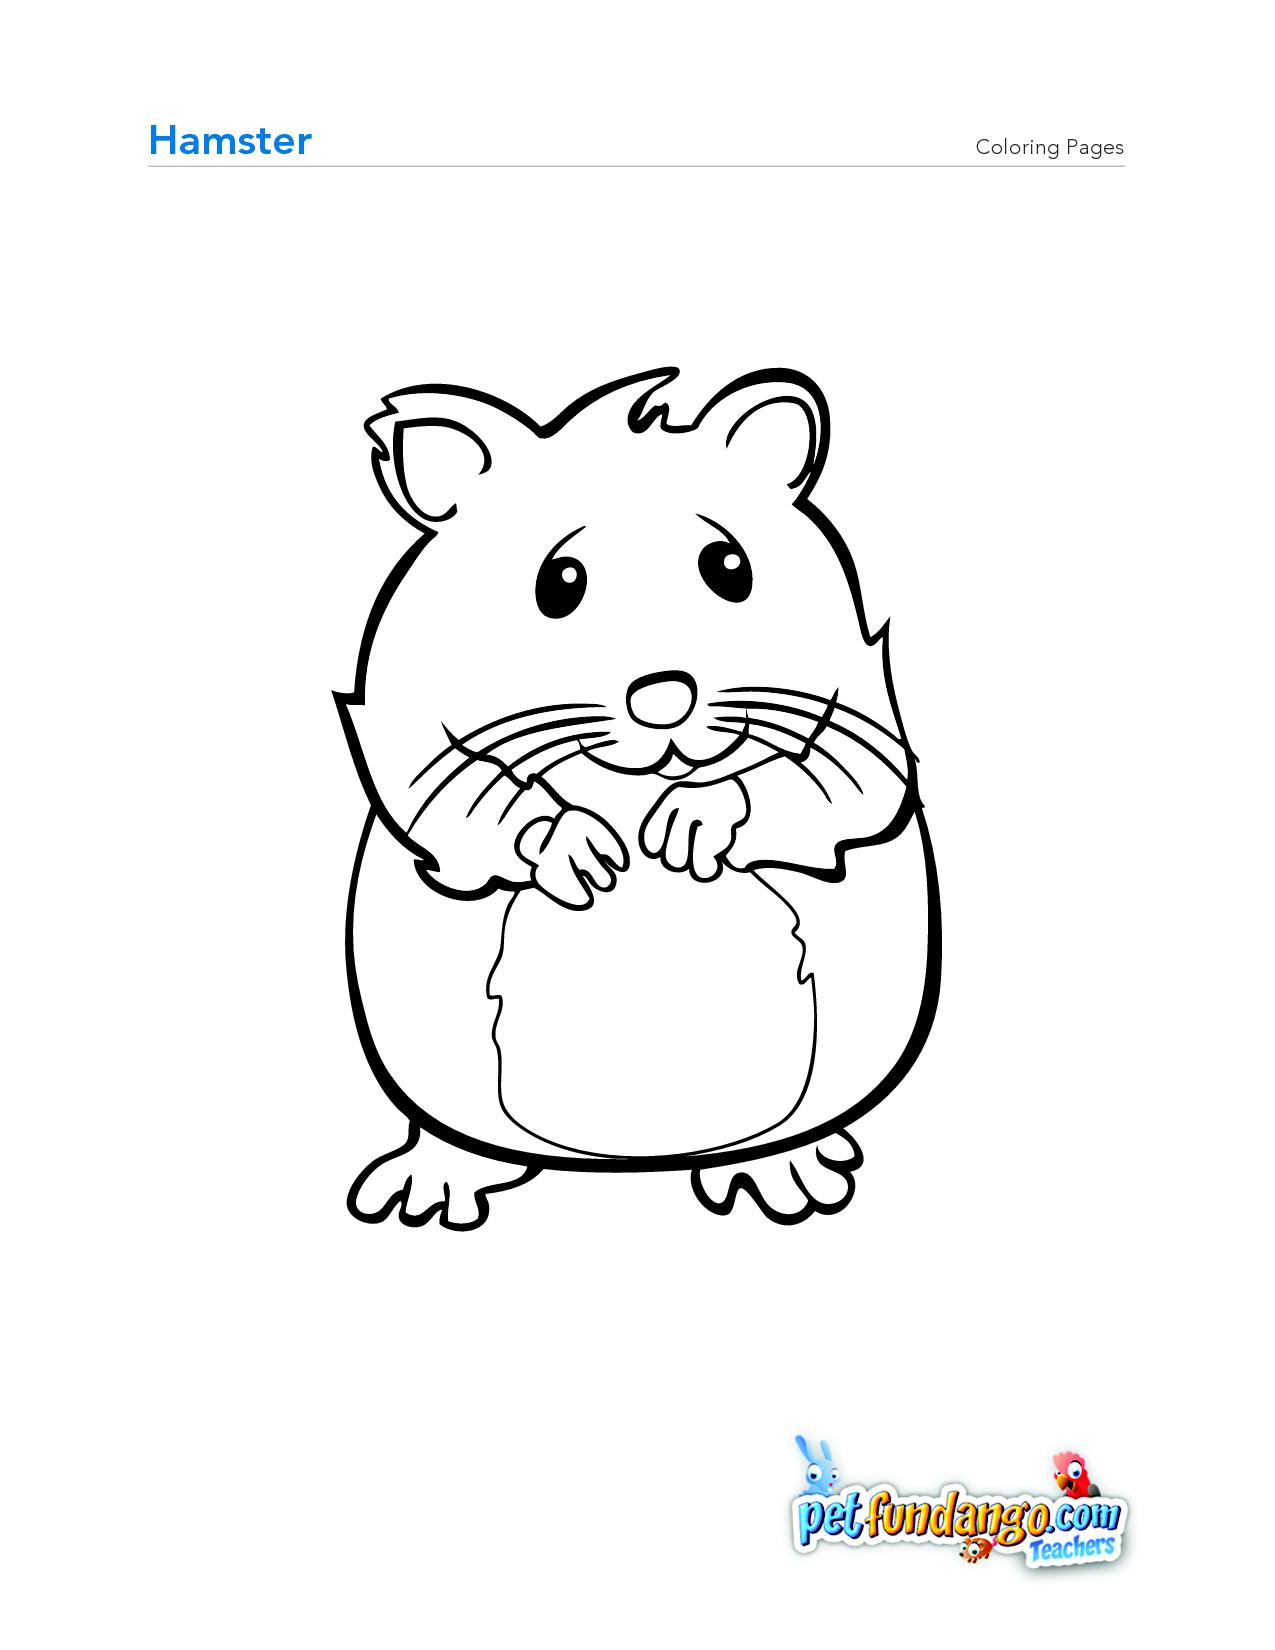 1275x1650 Hamster Coloring Page Osob Preschool Farm, Pet